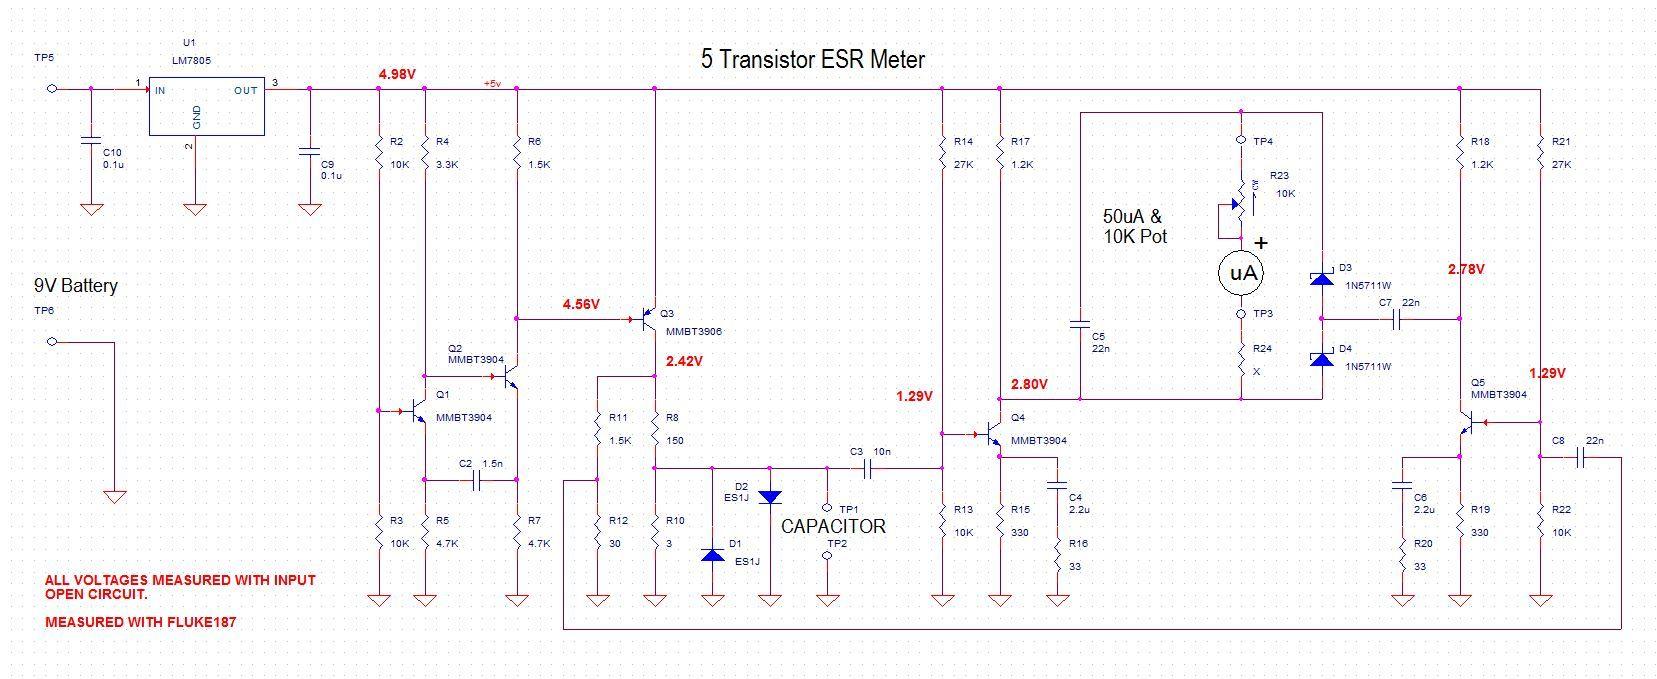 5 Transistor Esr Meter Design Page Detectors Gt Various Circuits Power Loss Detector L11996 Nextgr Circuit Jay